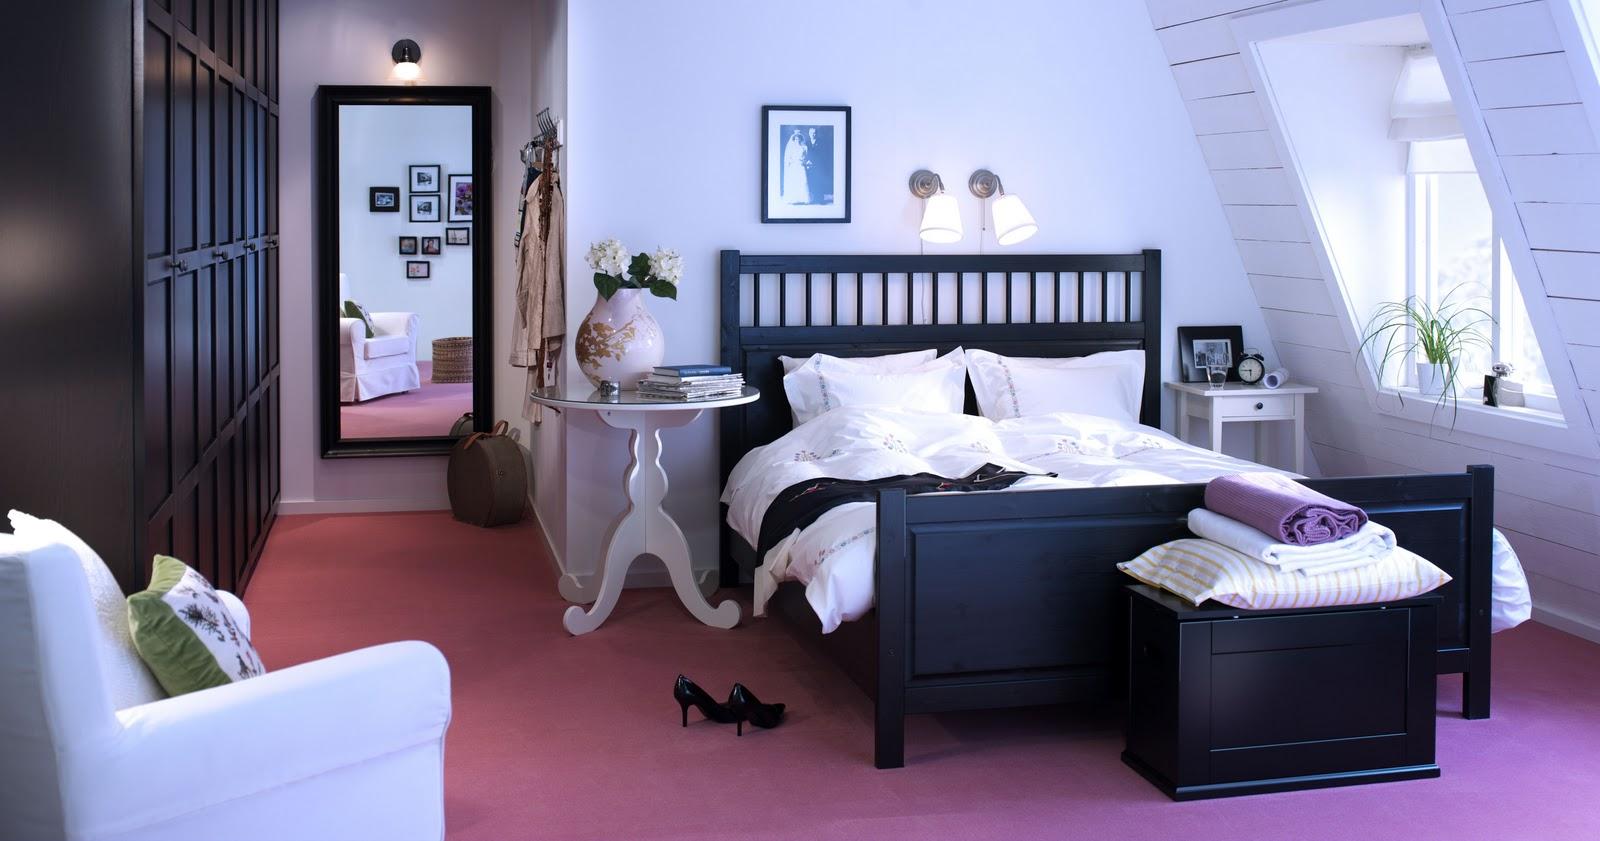 Dormitorio Ikea ~ Dormitorios Hemnes de ikea x4duros com